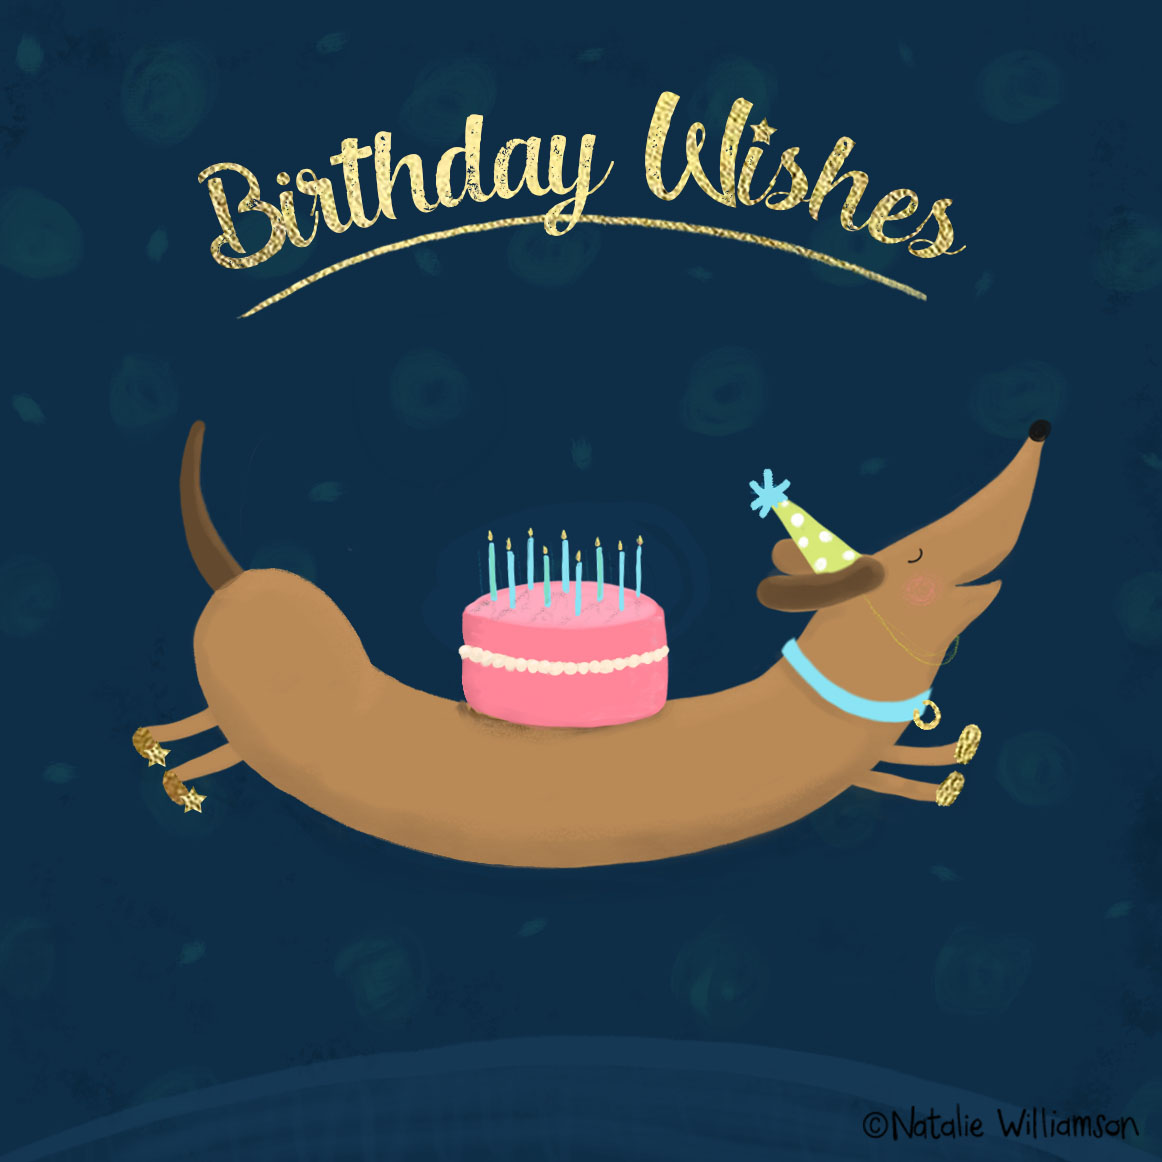 birthday sausage dog 2017 birthday wishes.jpg